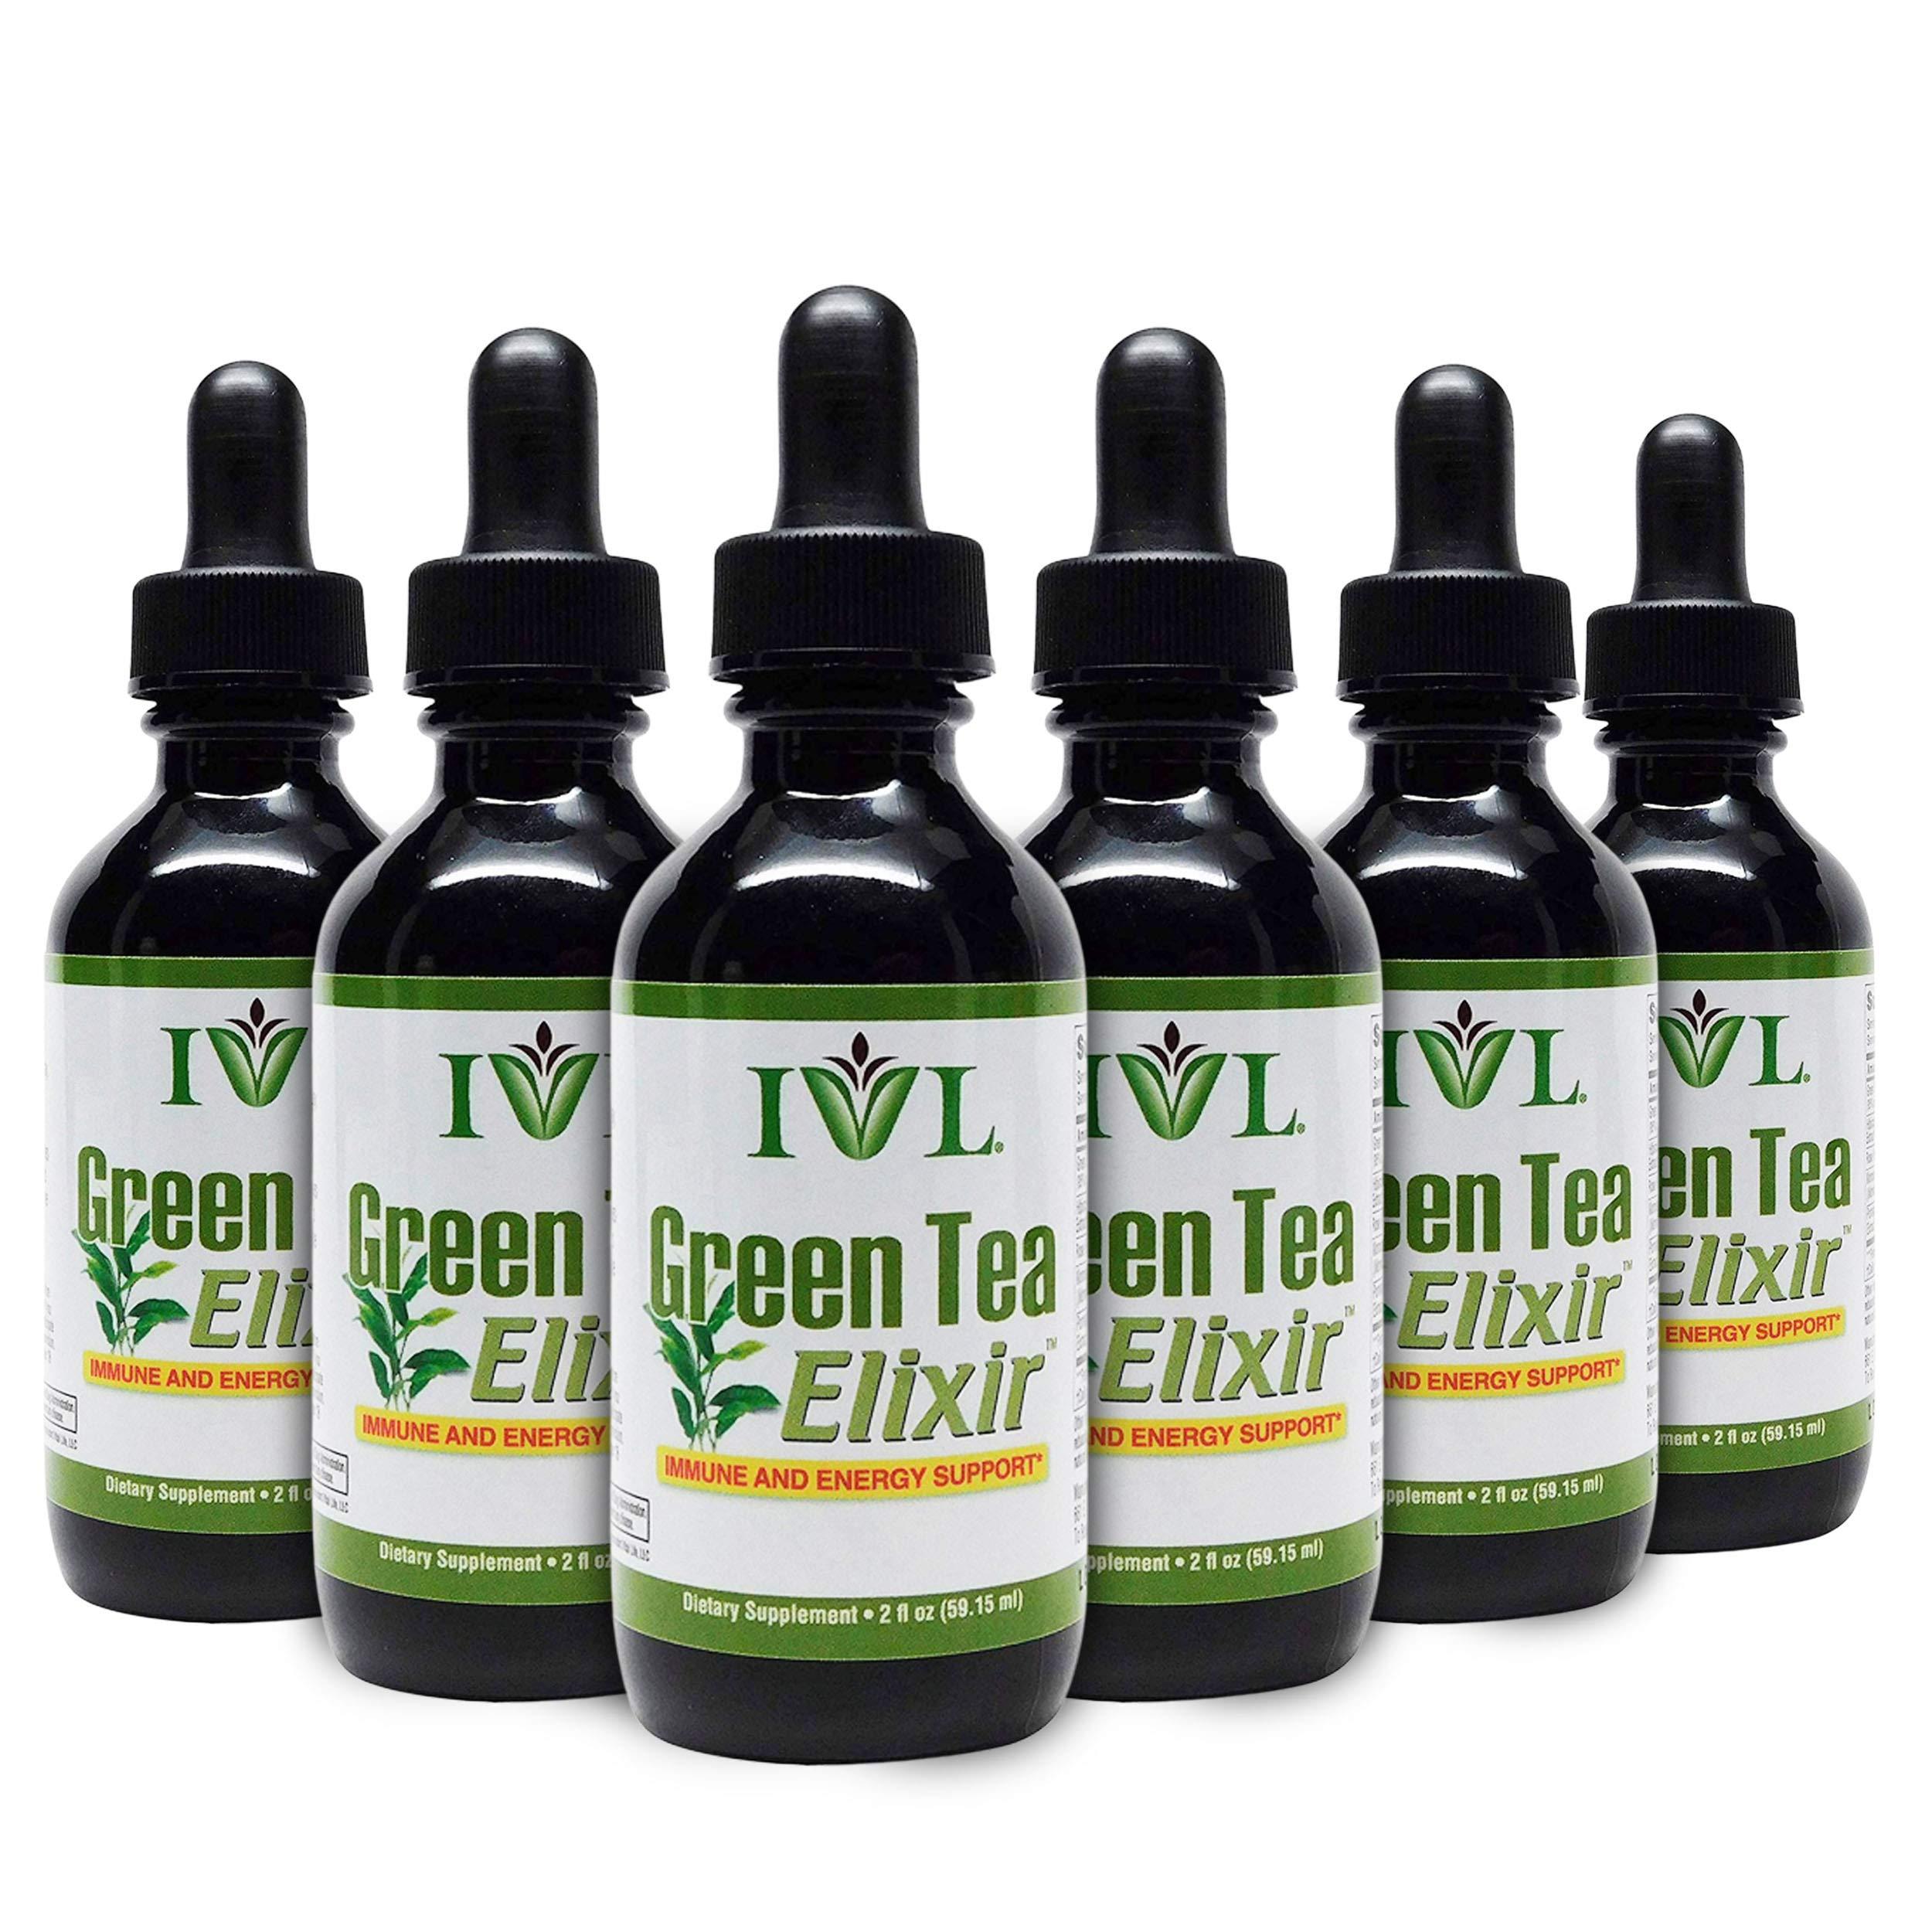 IVL Green Tea Elixir, Energy & Immune Support Dietary Supplement Formula, 1 fl oz (Pack of 6) by IVL